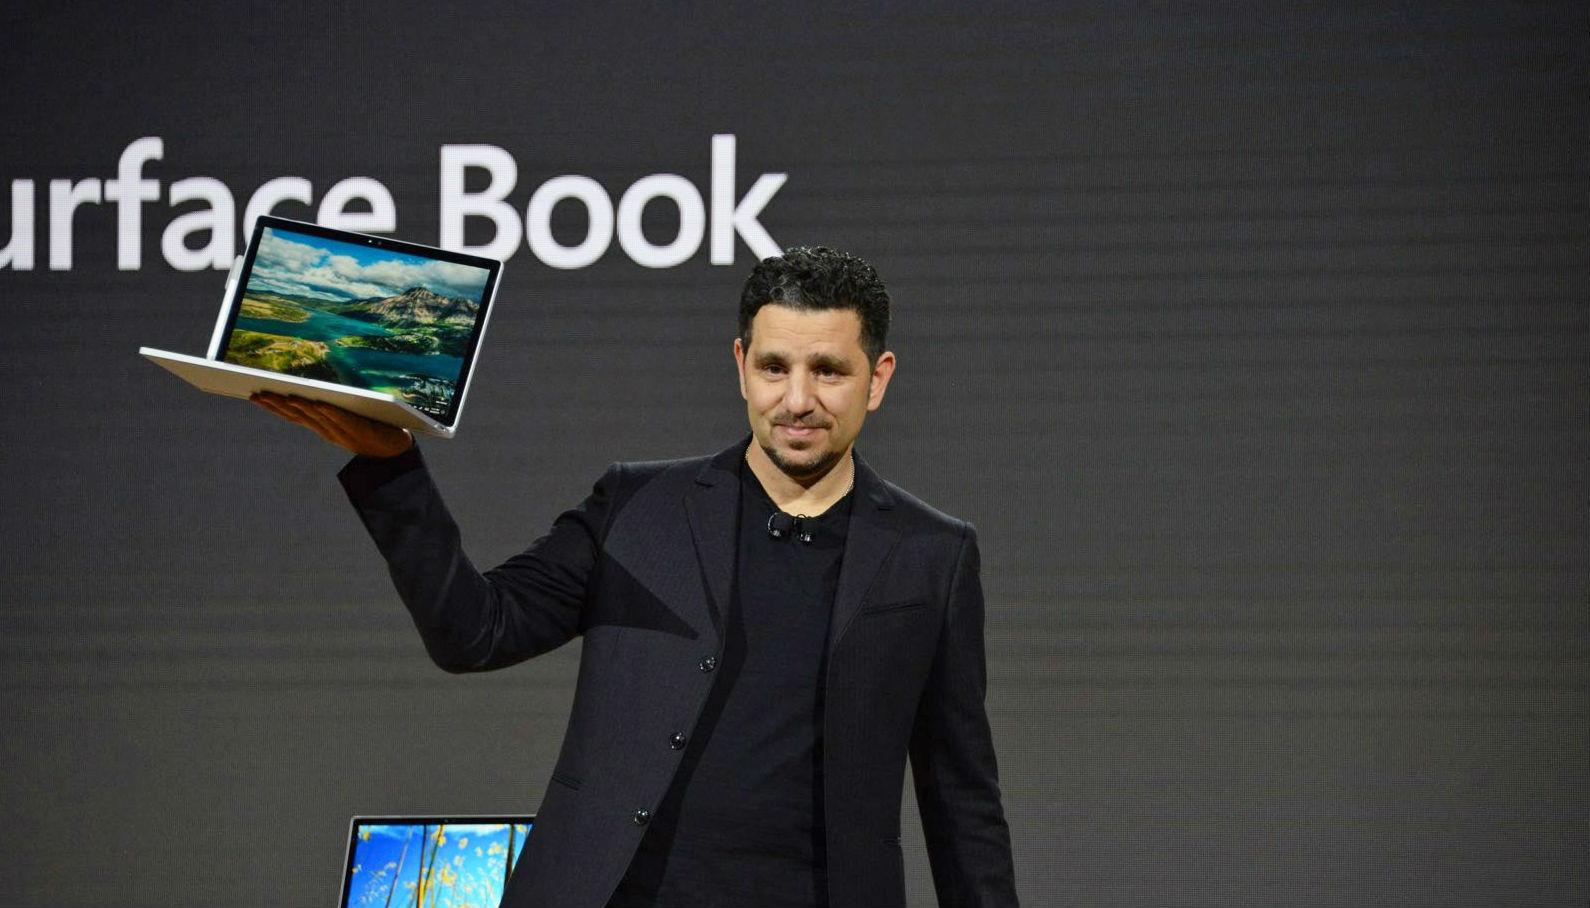 Surface Book i7 أحدث أجهزة الحاسبات المتحولة من مايكروسوفت بسعر 2399$